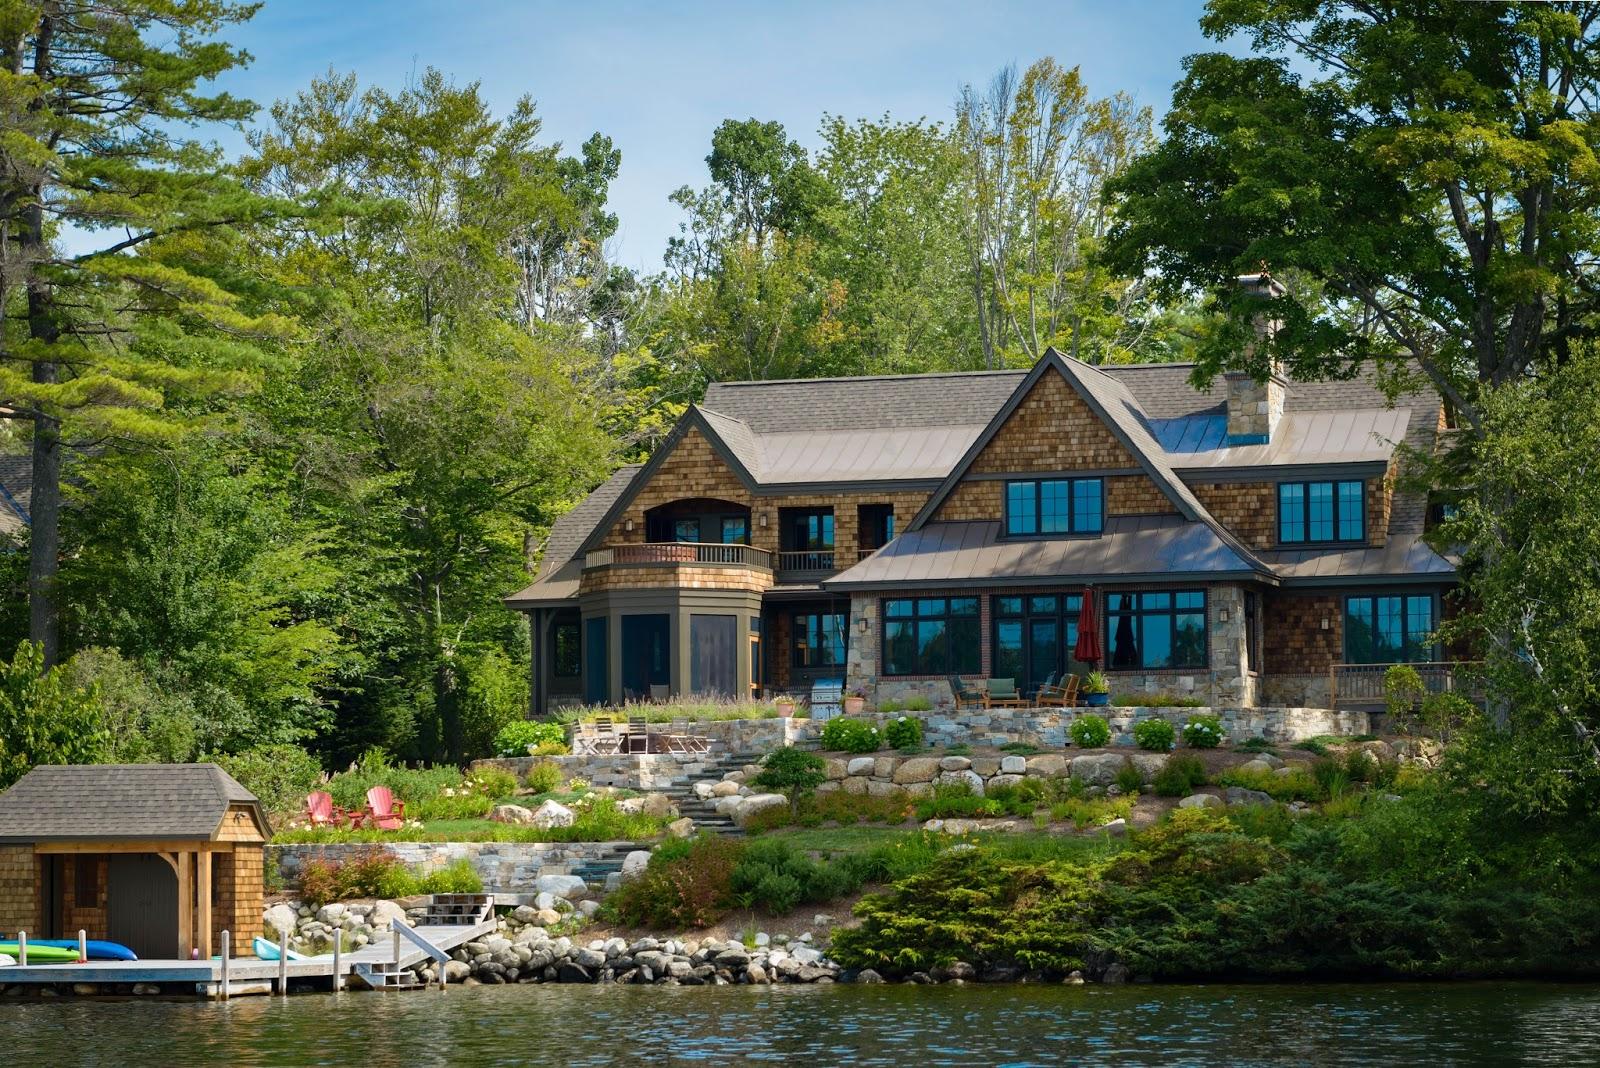 Green Home Design Architect: 2016 New Hampshire Home